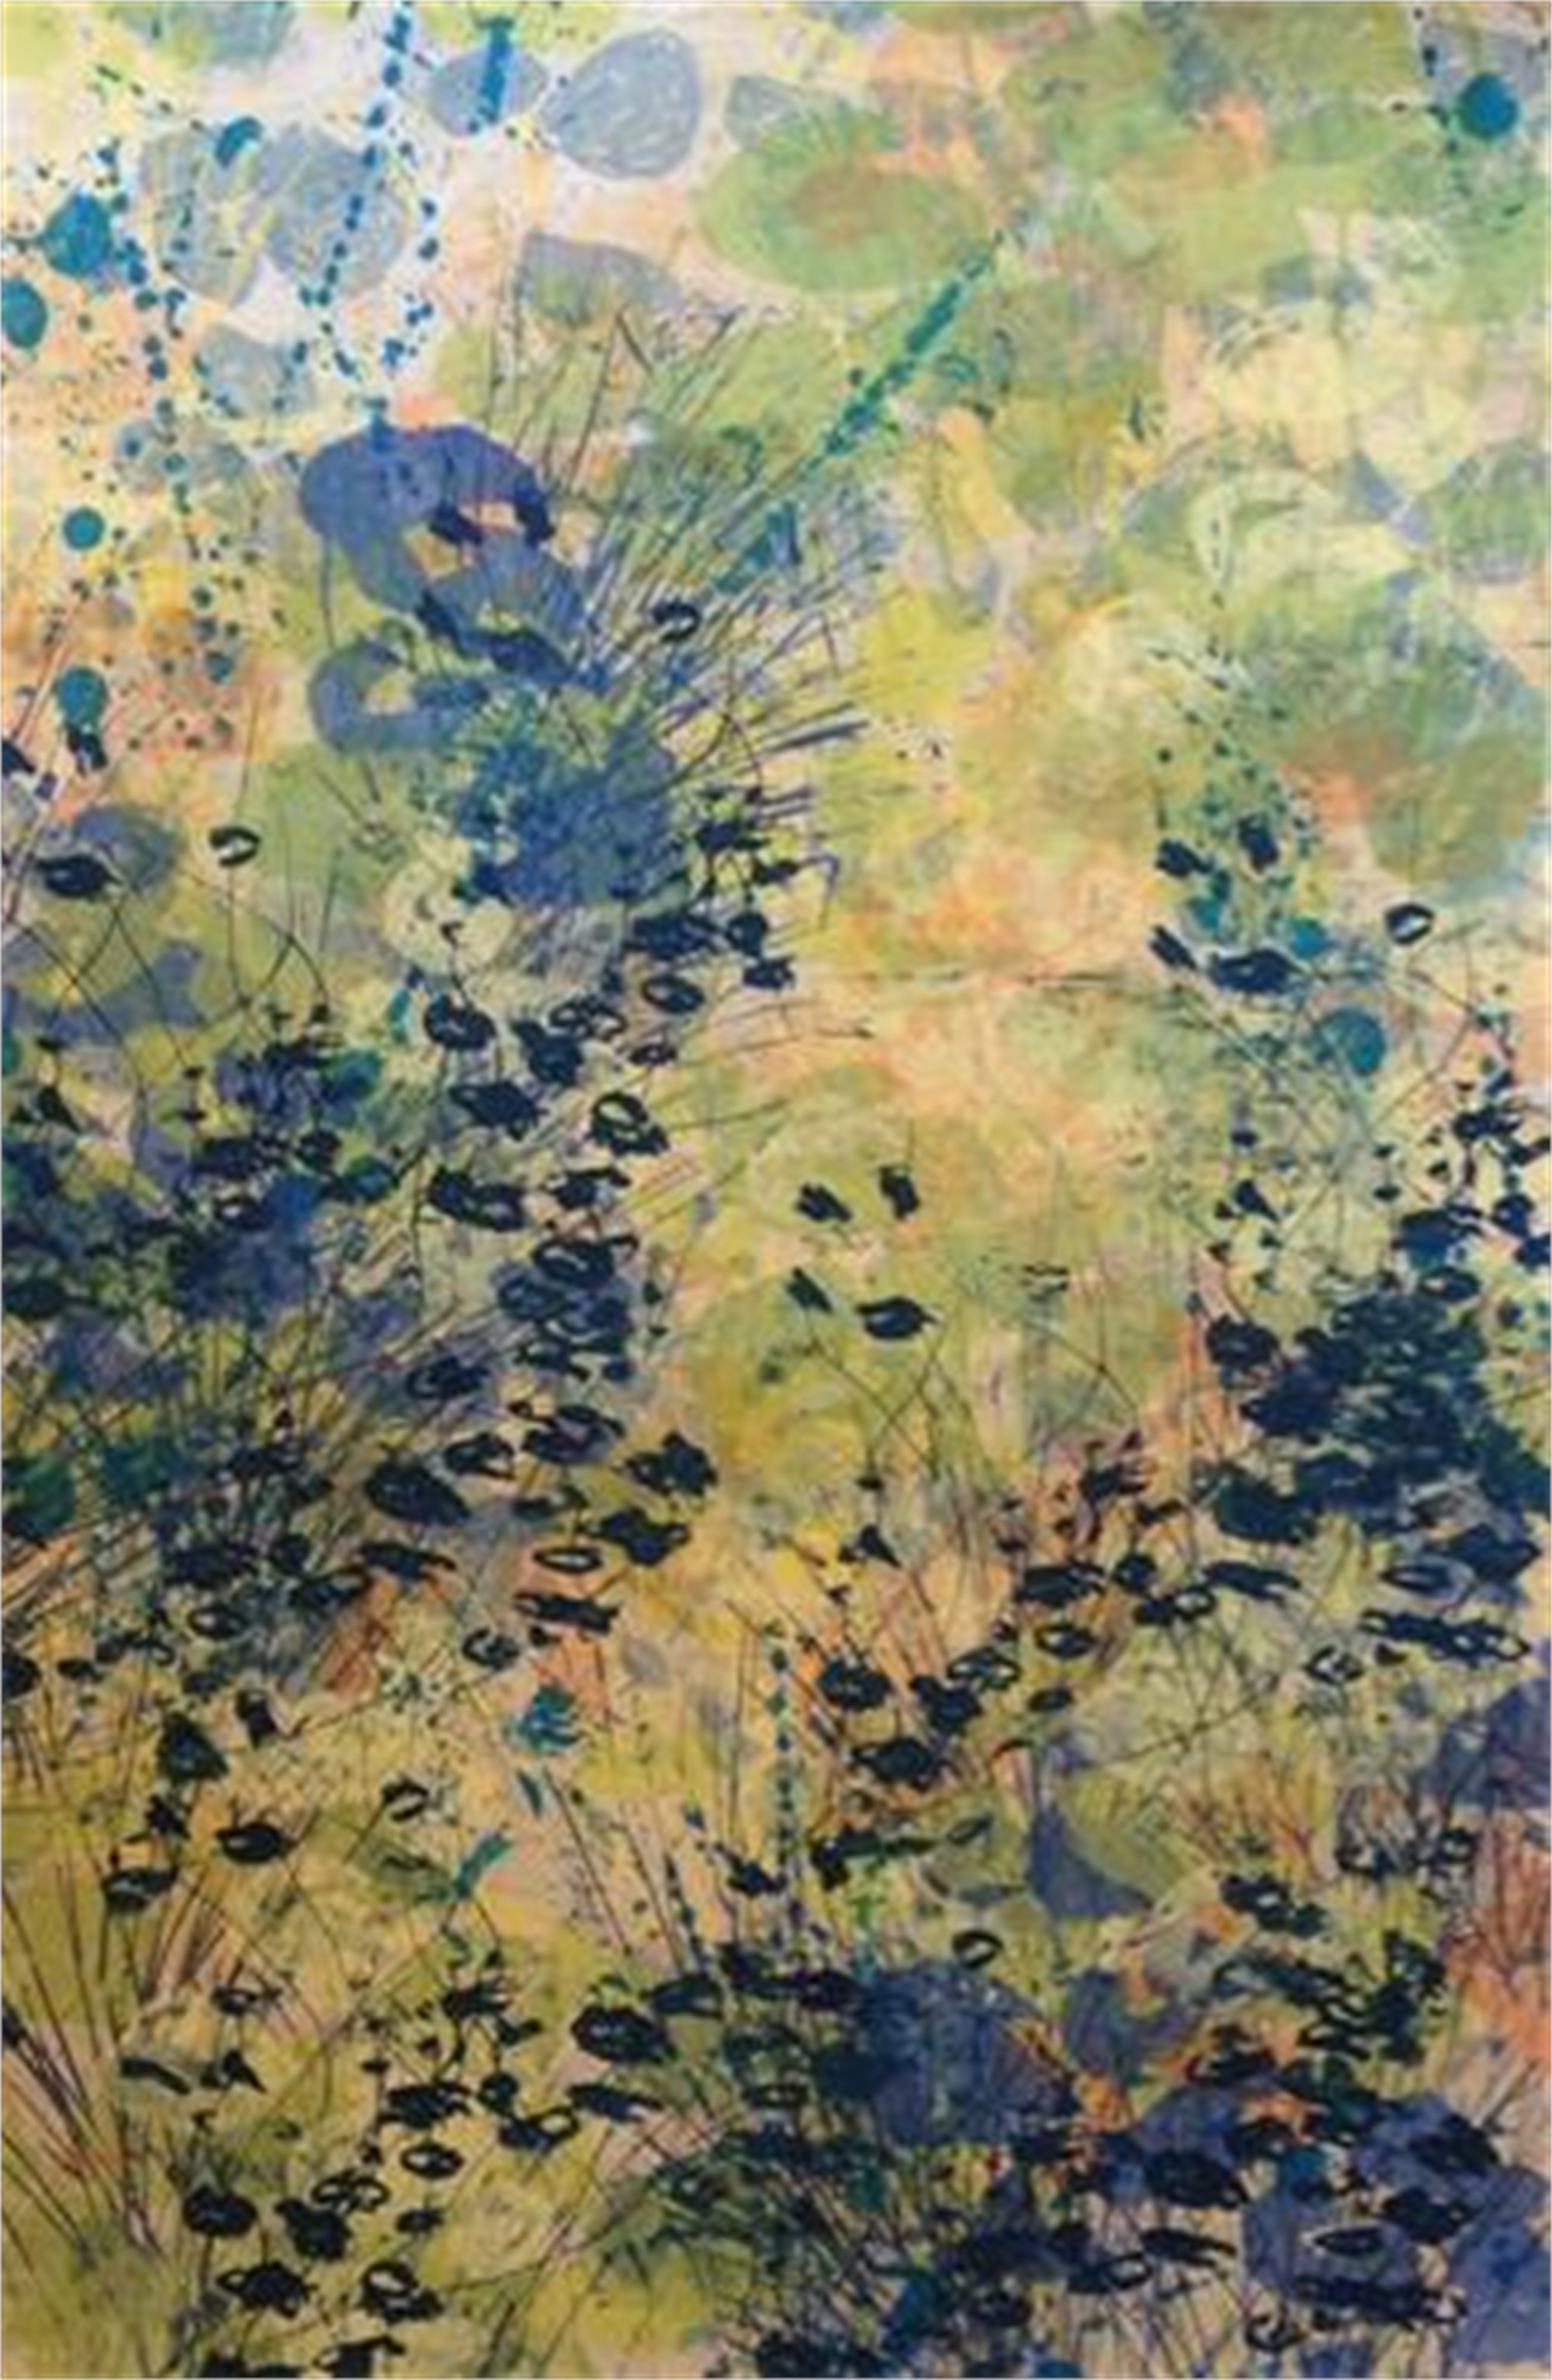 Alarie by John Thompson